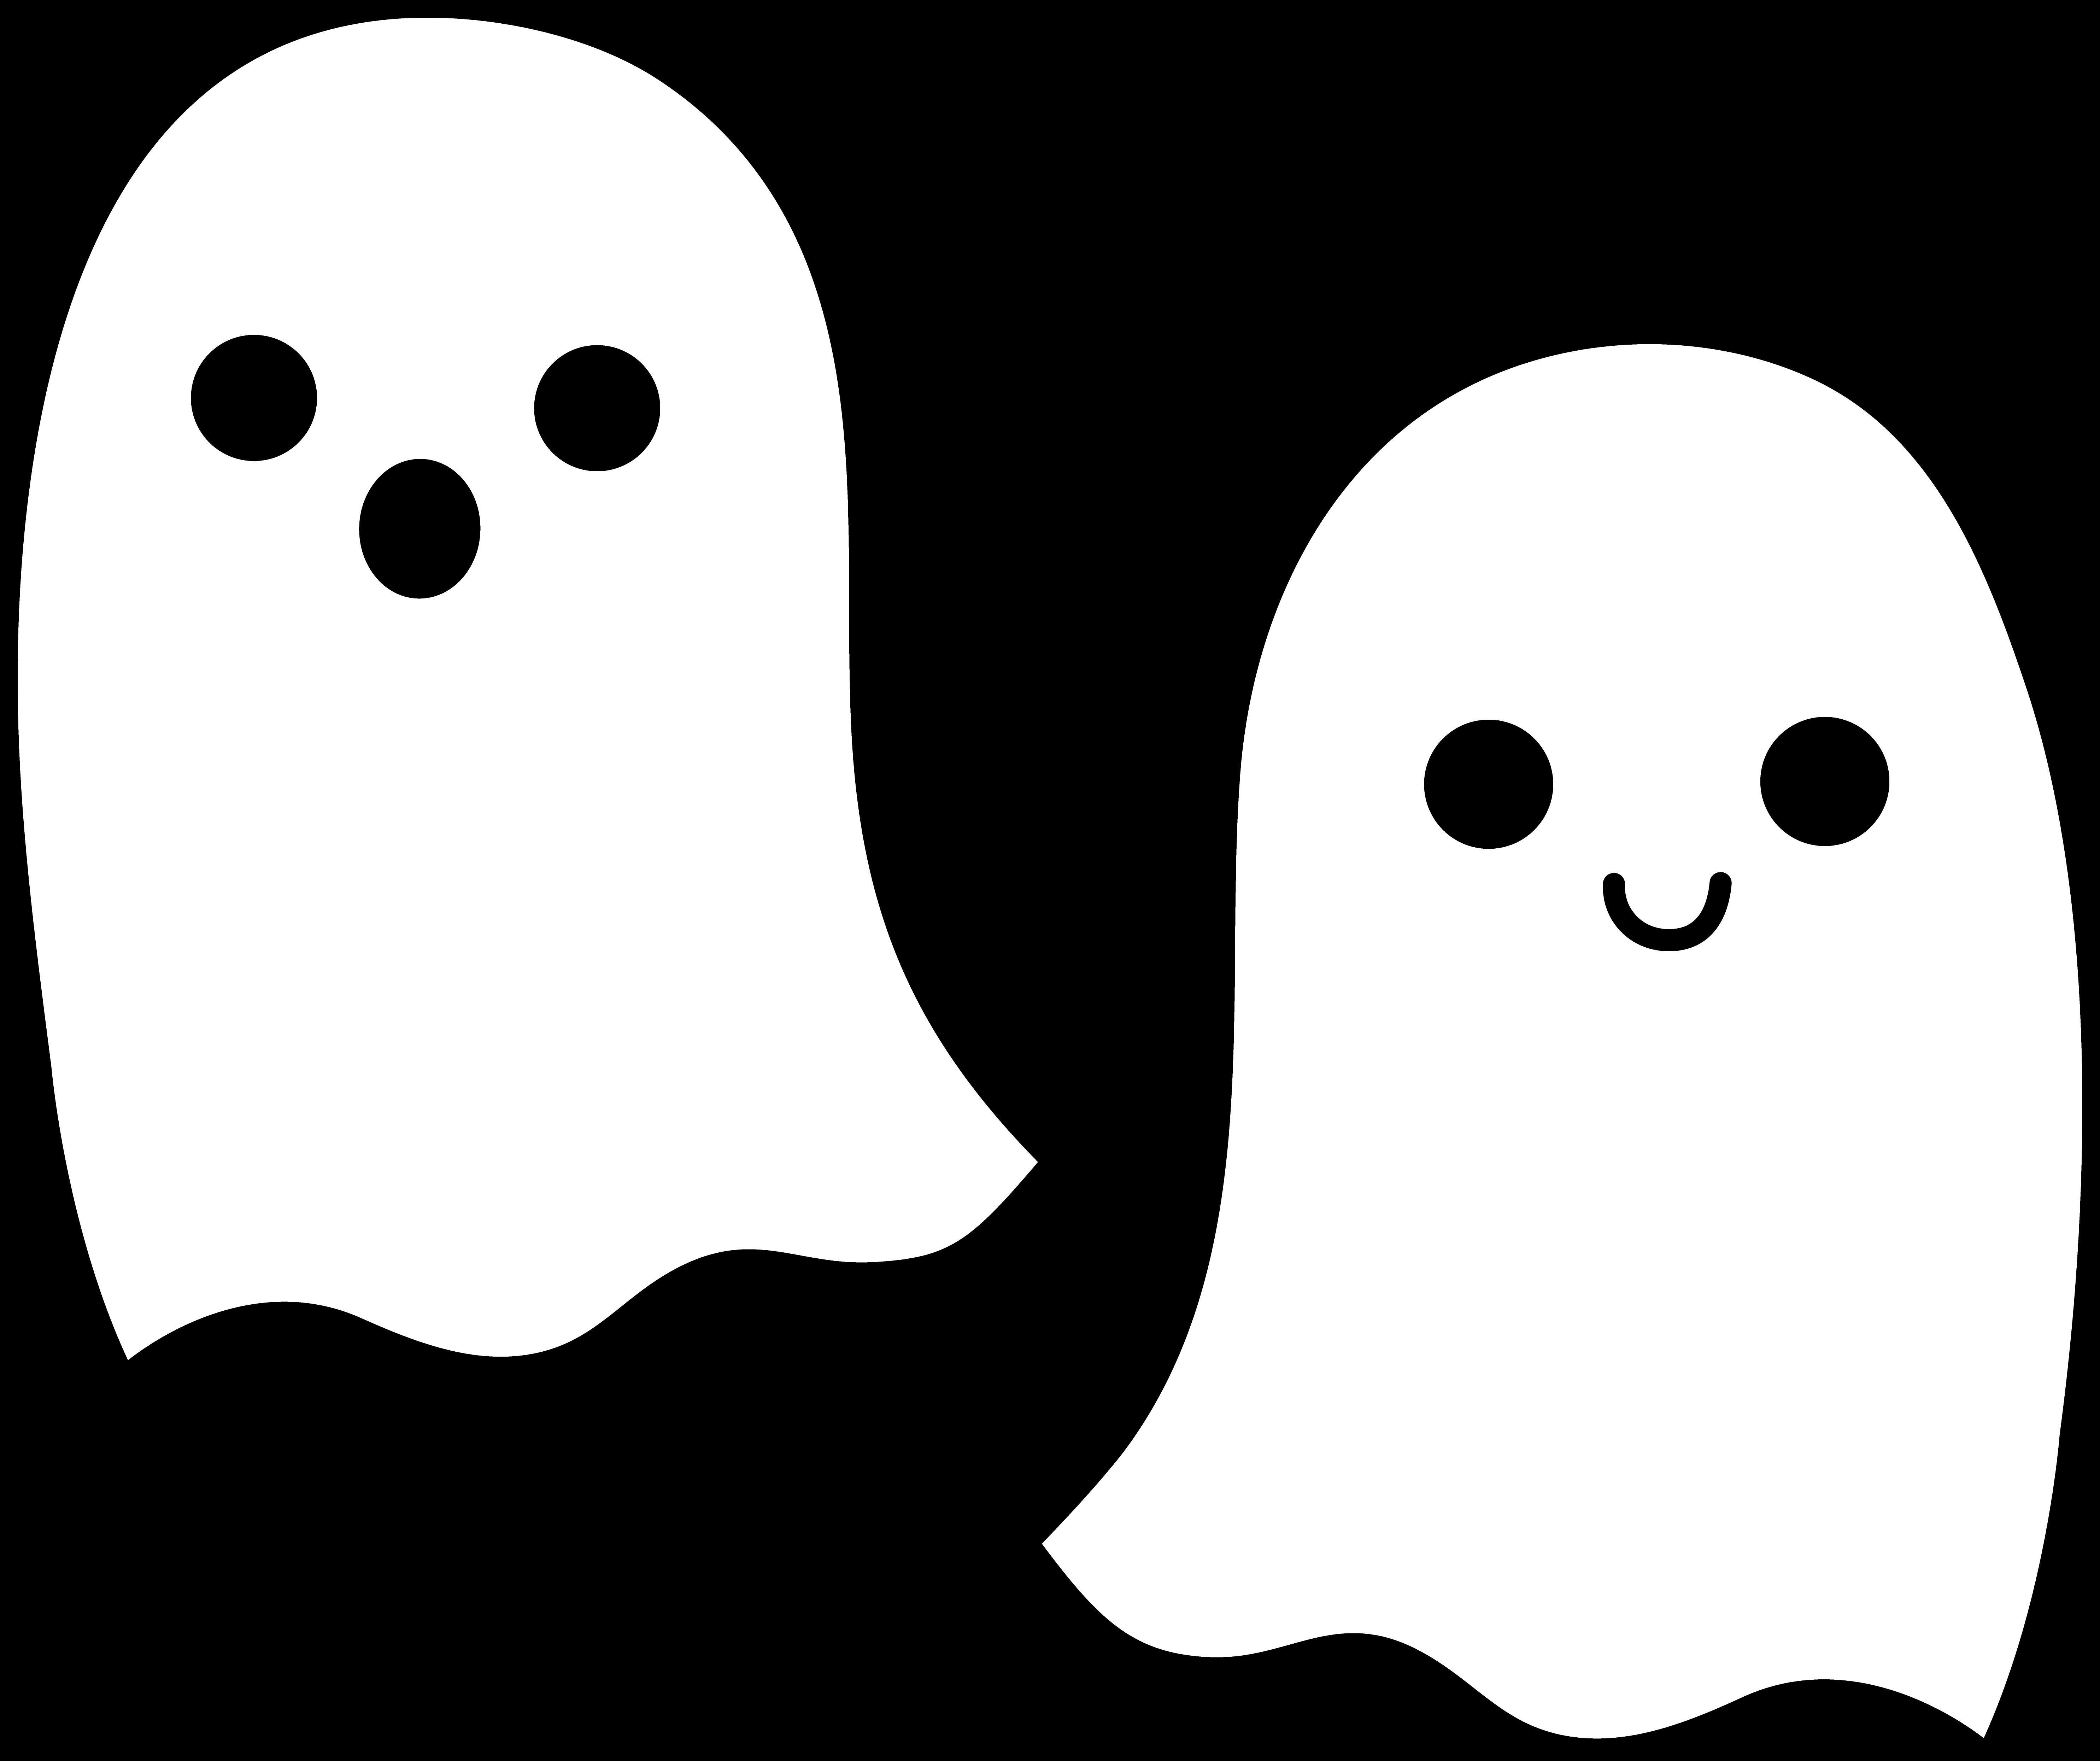 Cute Ghosts Halloween Design.